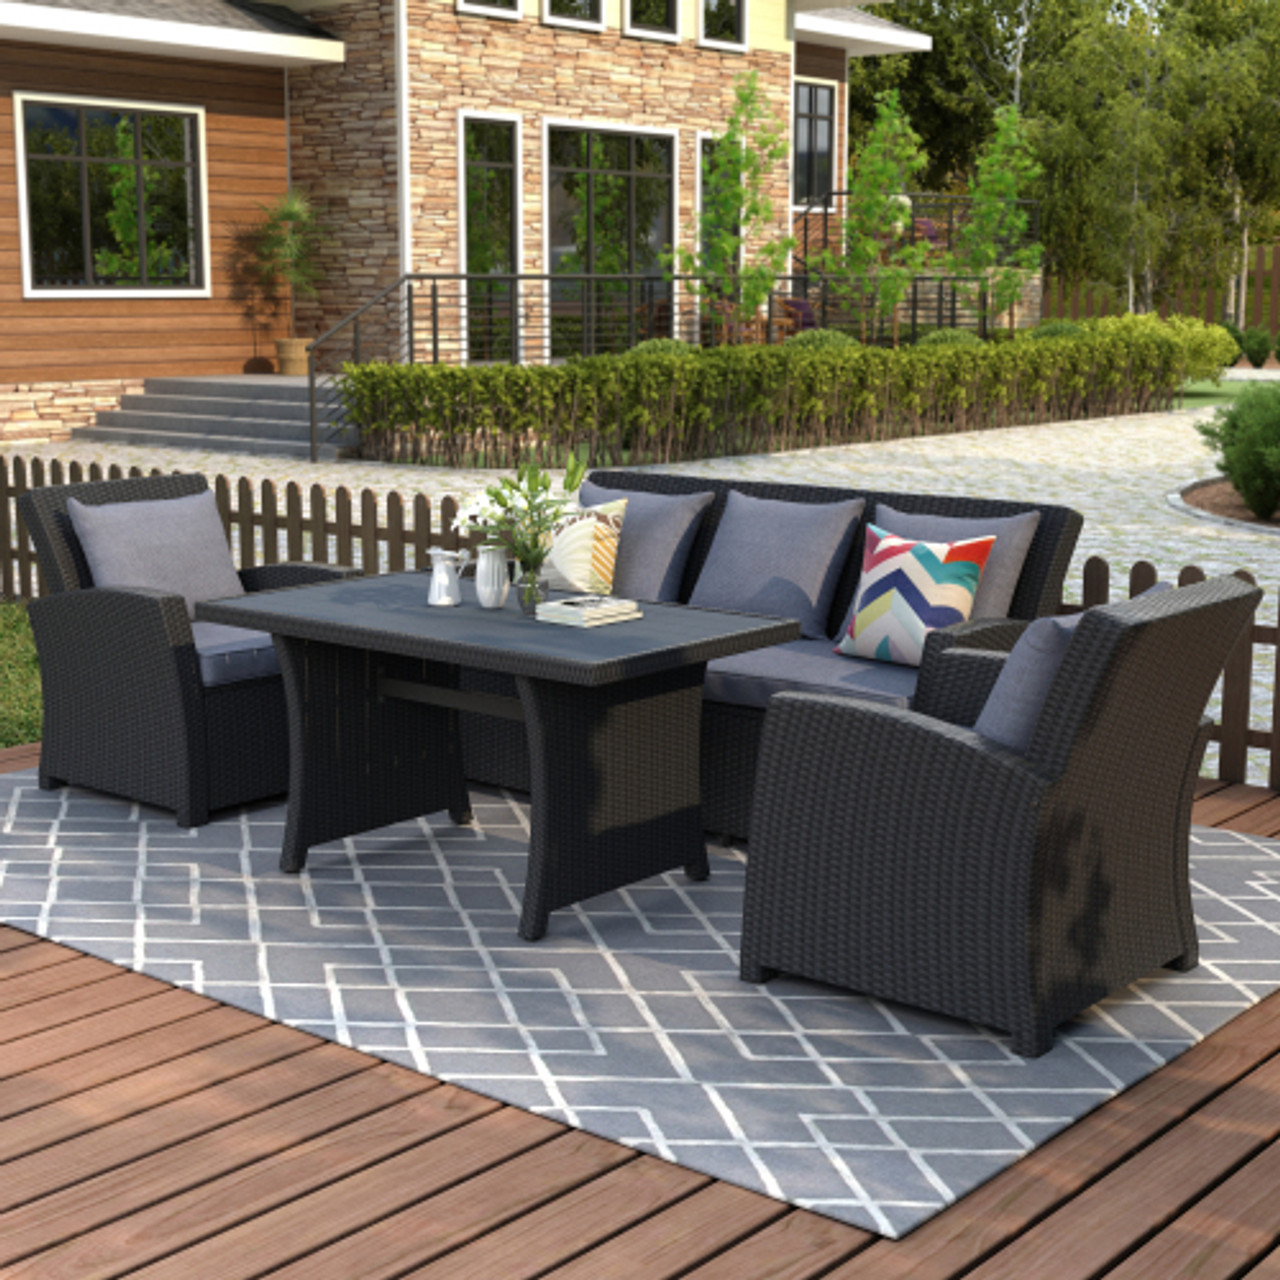 u style outdoor patio furniture set 4 piece conversation set black wicker furniture sofa set with dark grey cushions